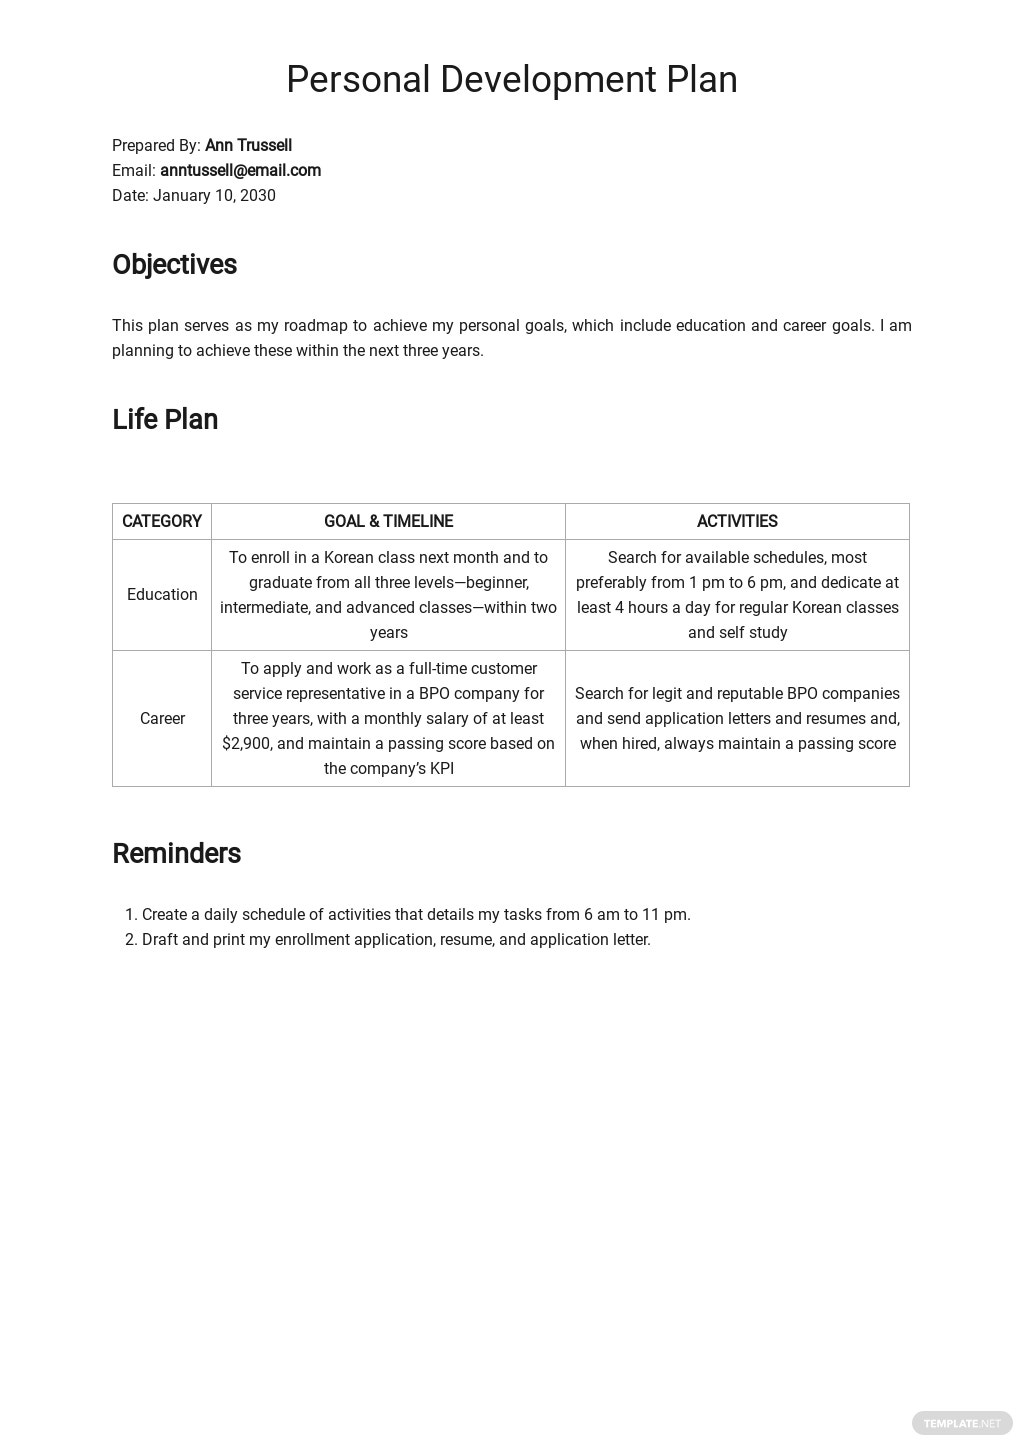 Sample Personal Development Plan Template.jpe